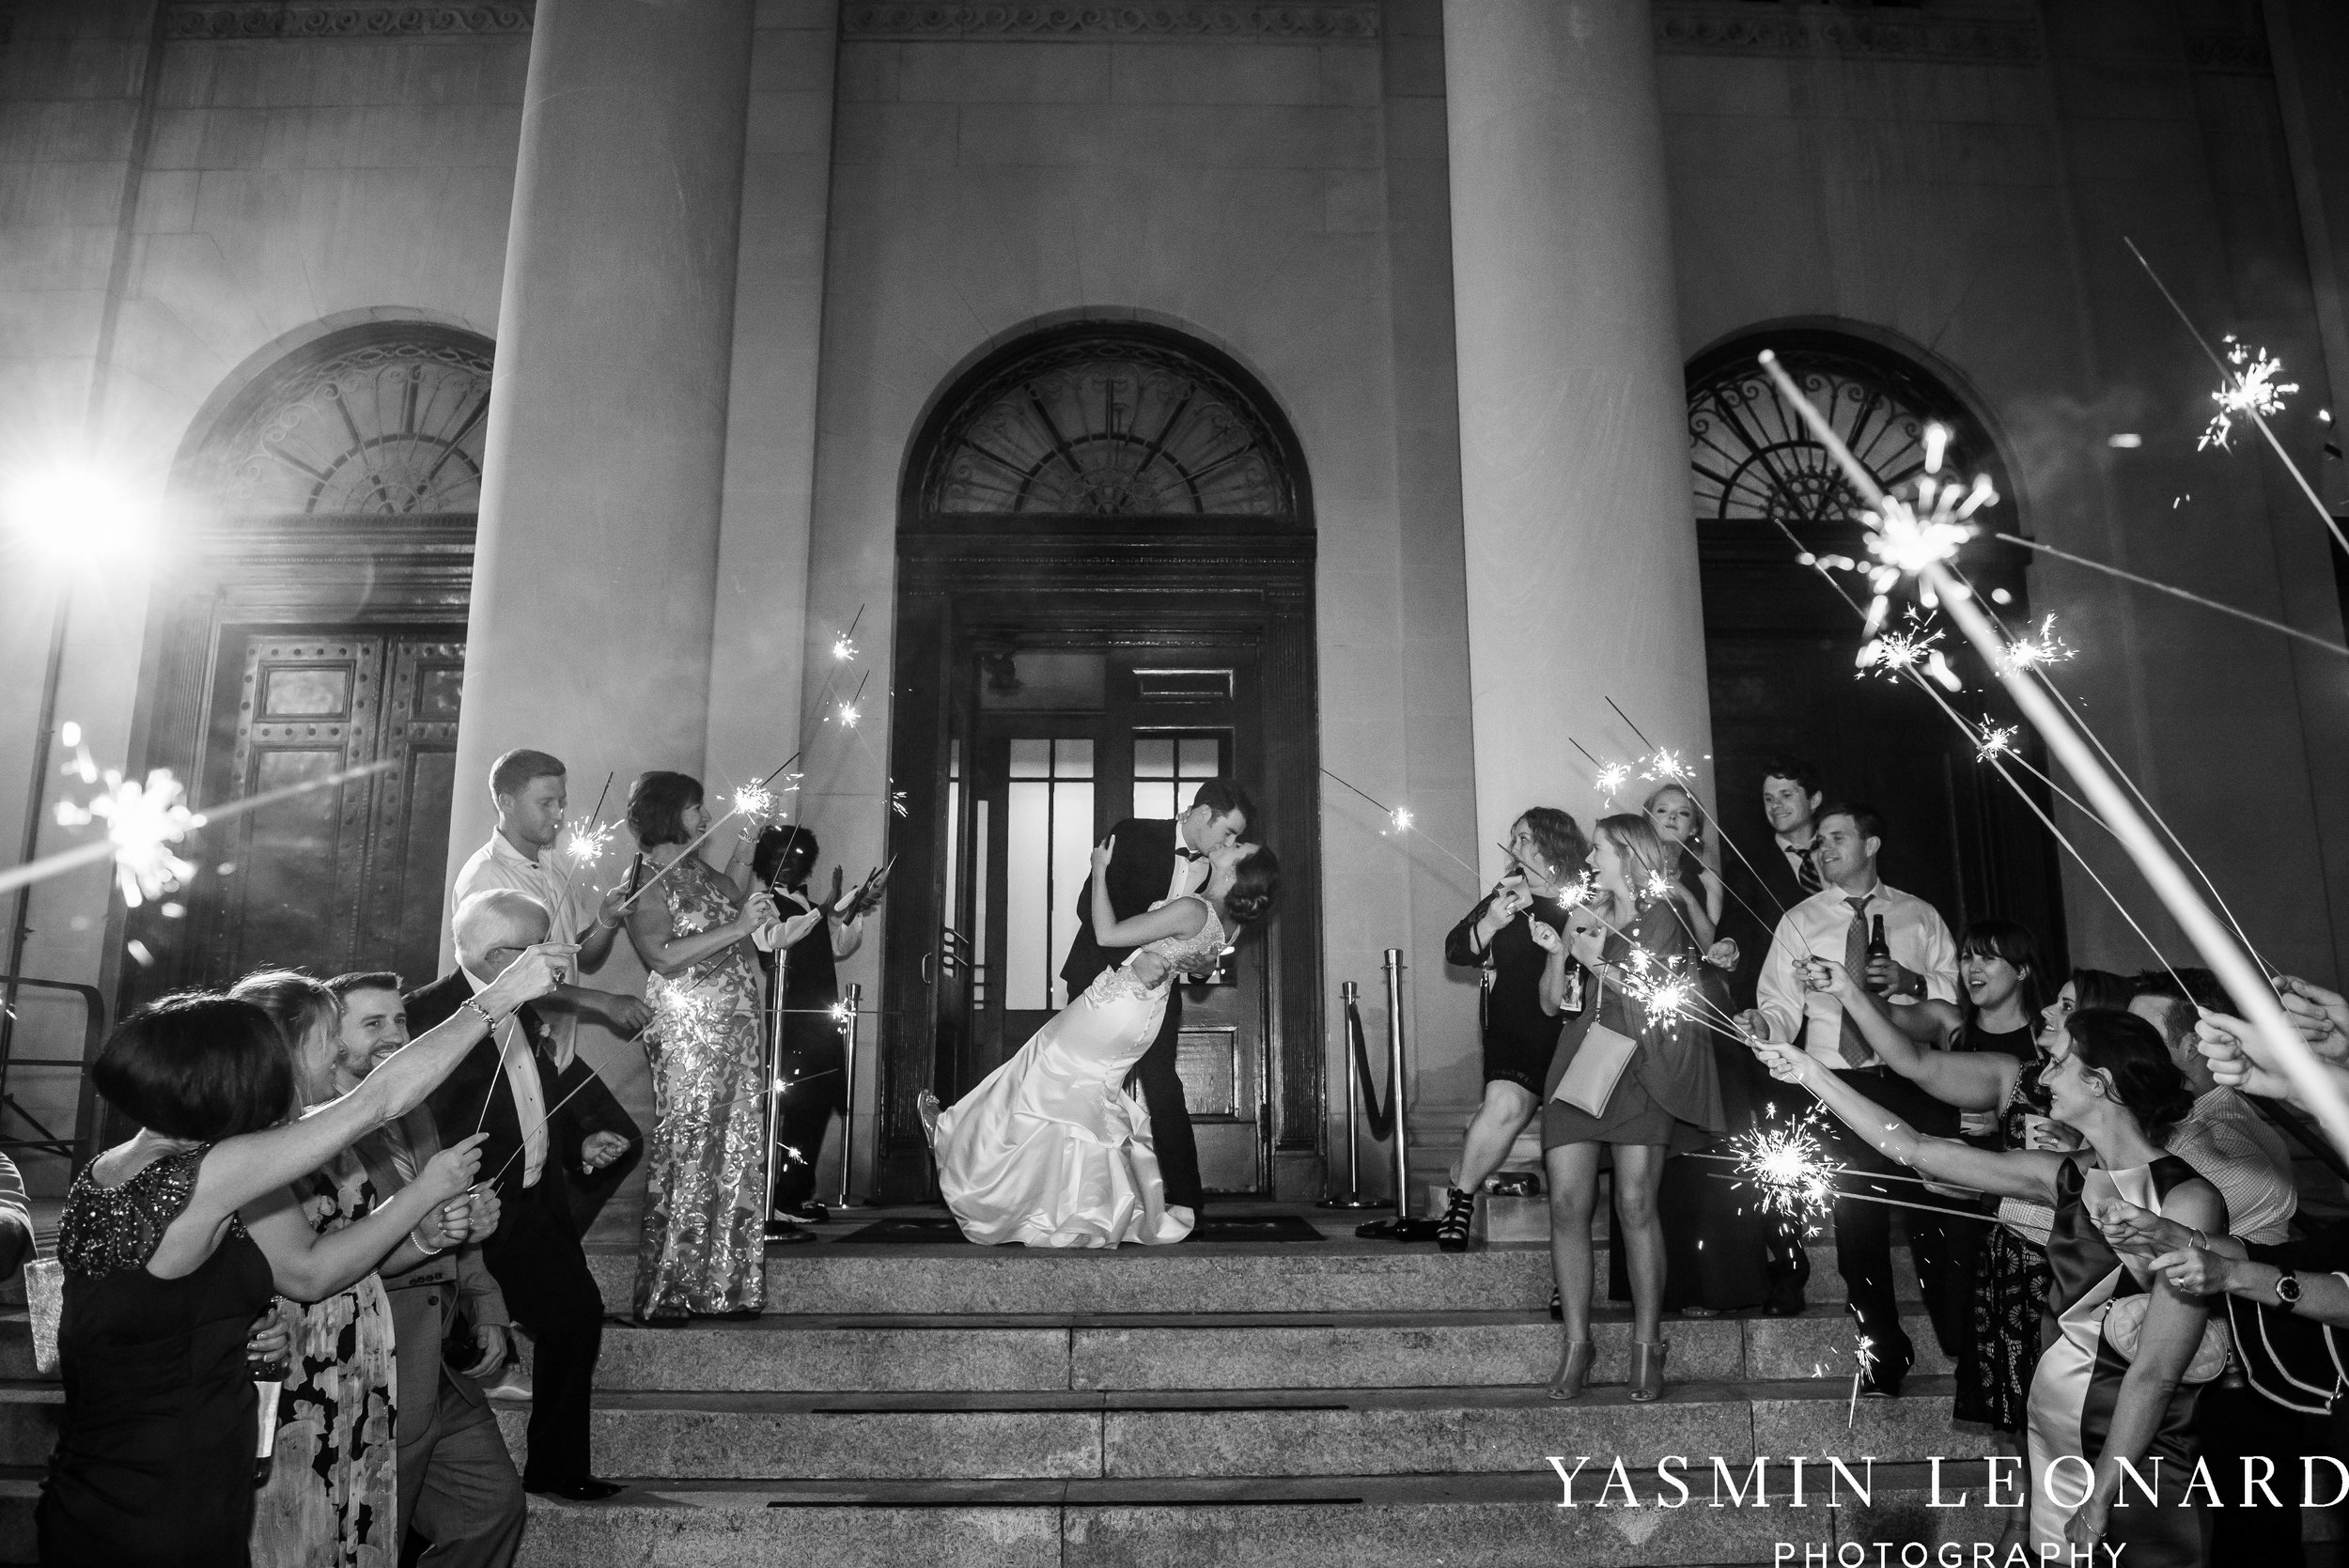 Millennium Center Wedding - Downtown Winston Salem - Winston Salem Wedding Photographer - Winston Salem Venues - Indoor Wedding Venues - NC Wedding Photographer - Yasmin Leonard Photography-86.jpg